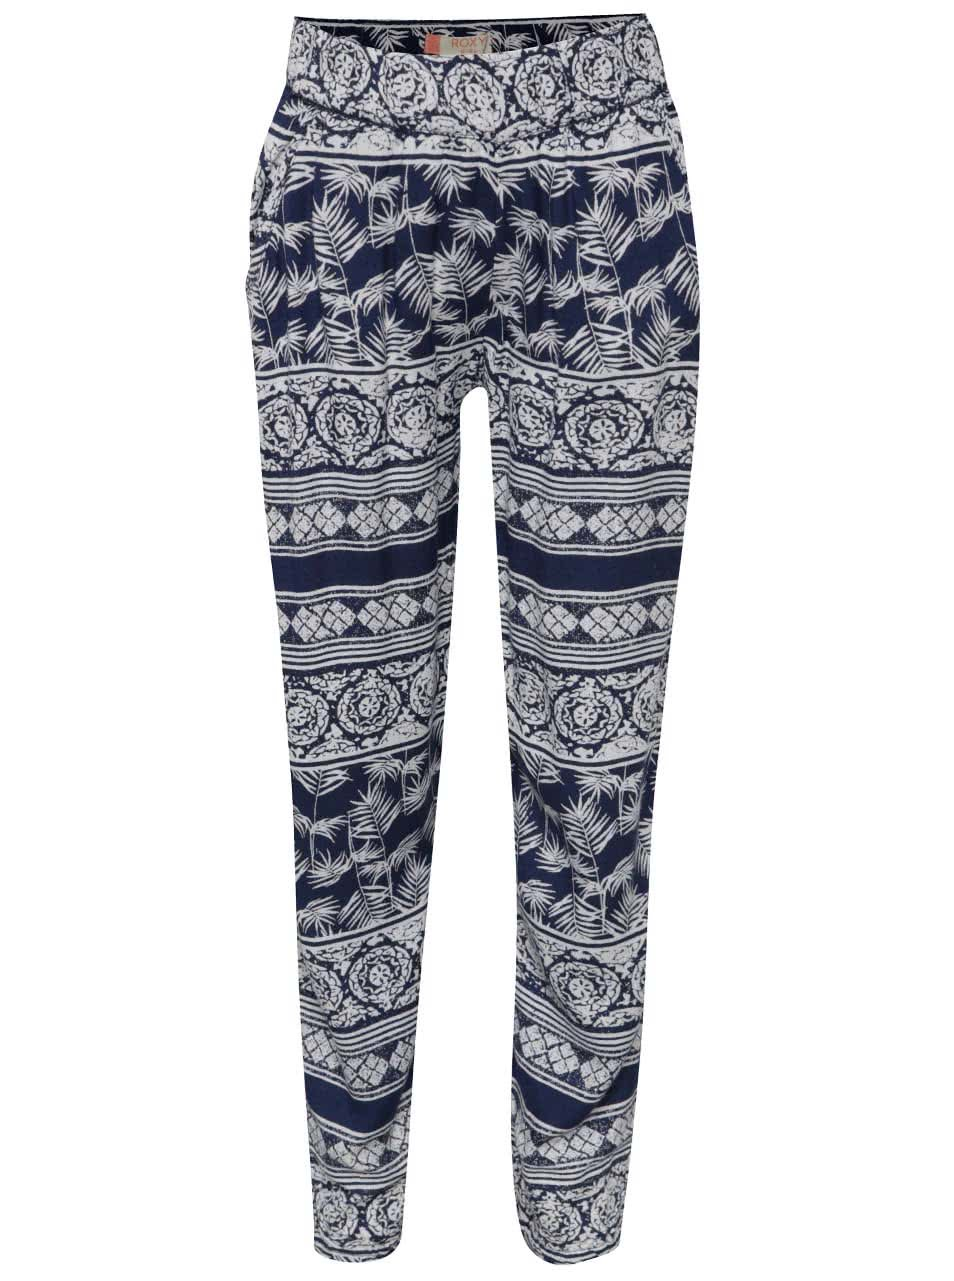 Bílo-modré holčičí vzorované kalhoty Roxy Wanna go holiday